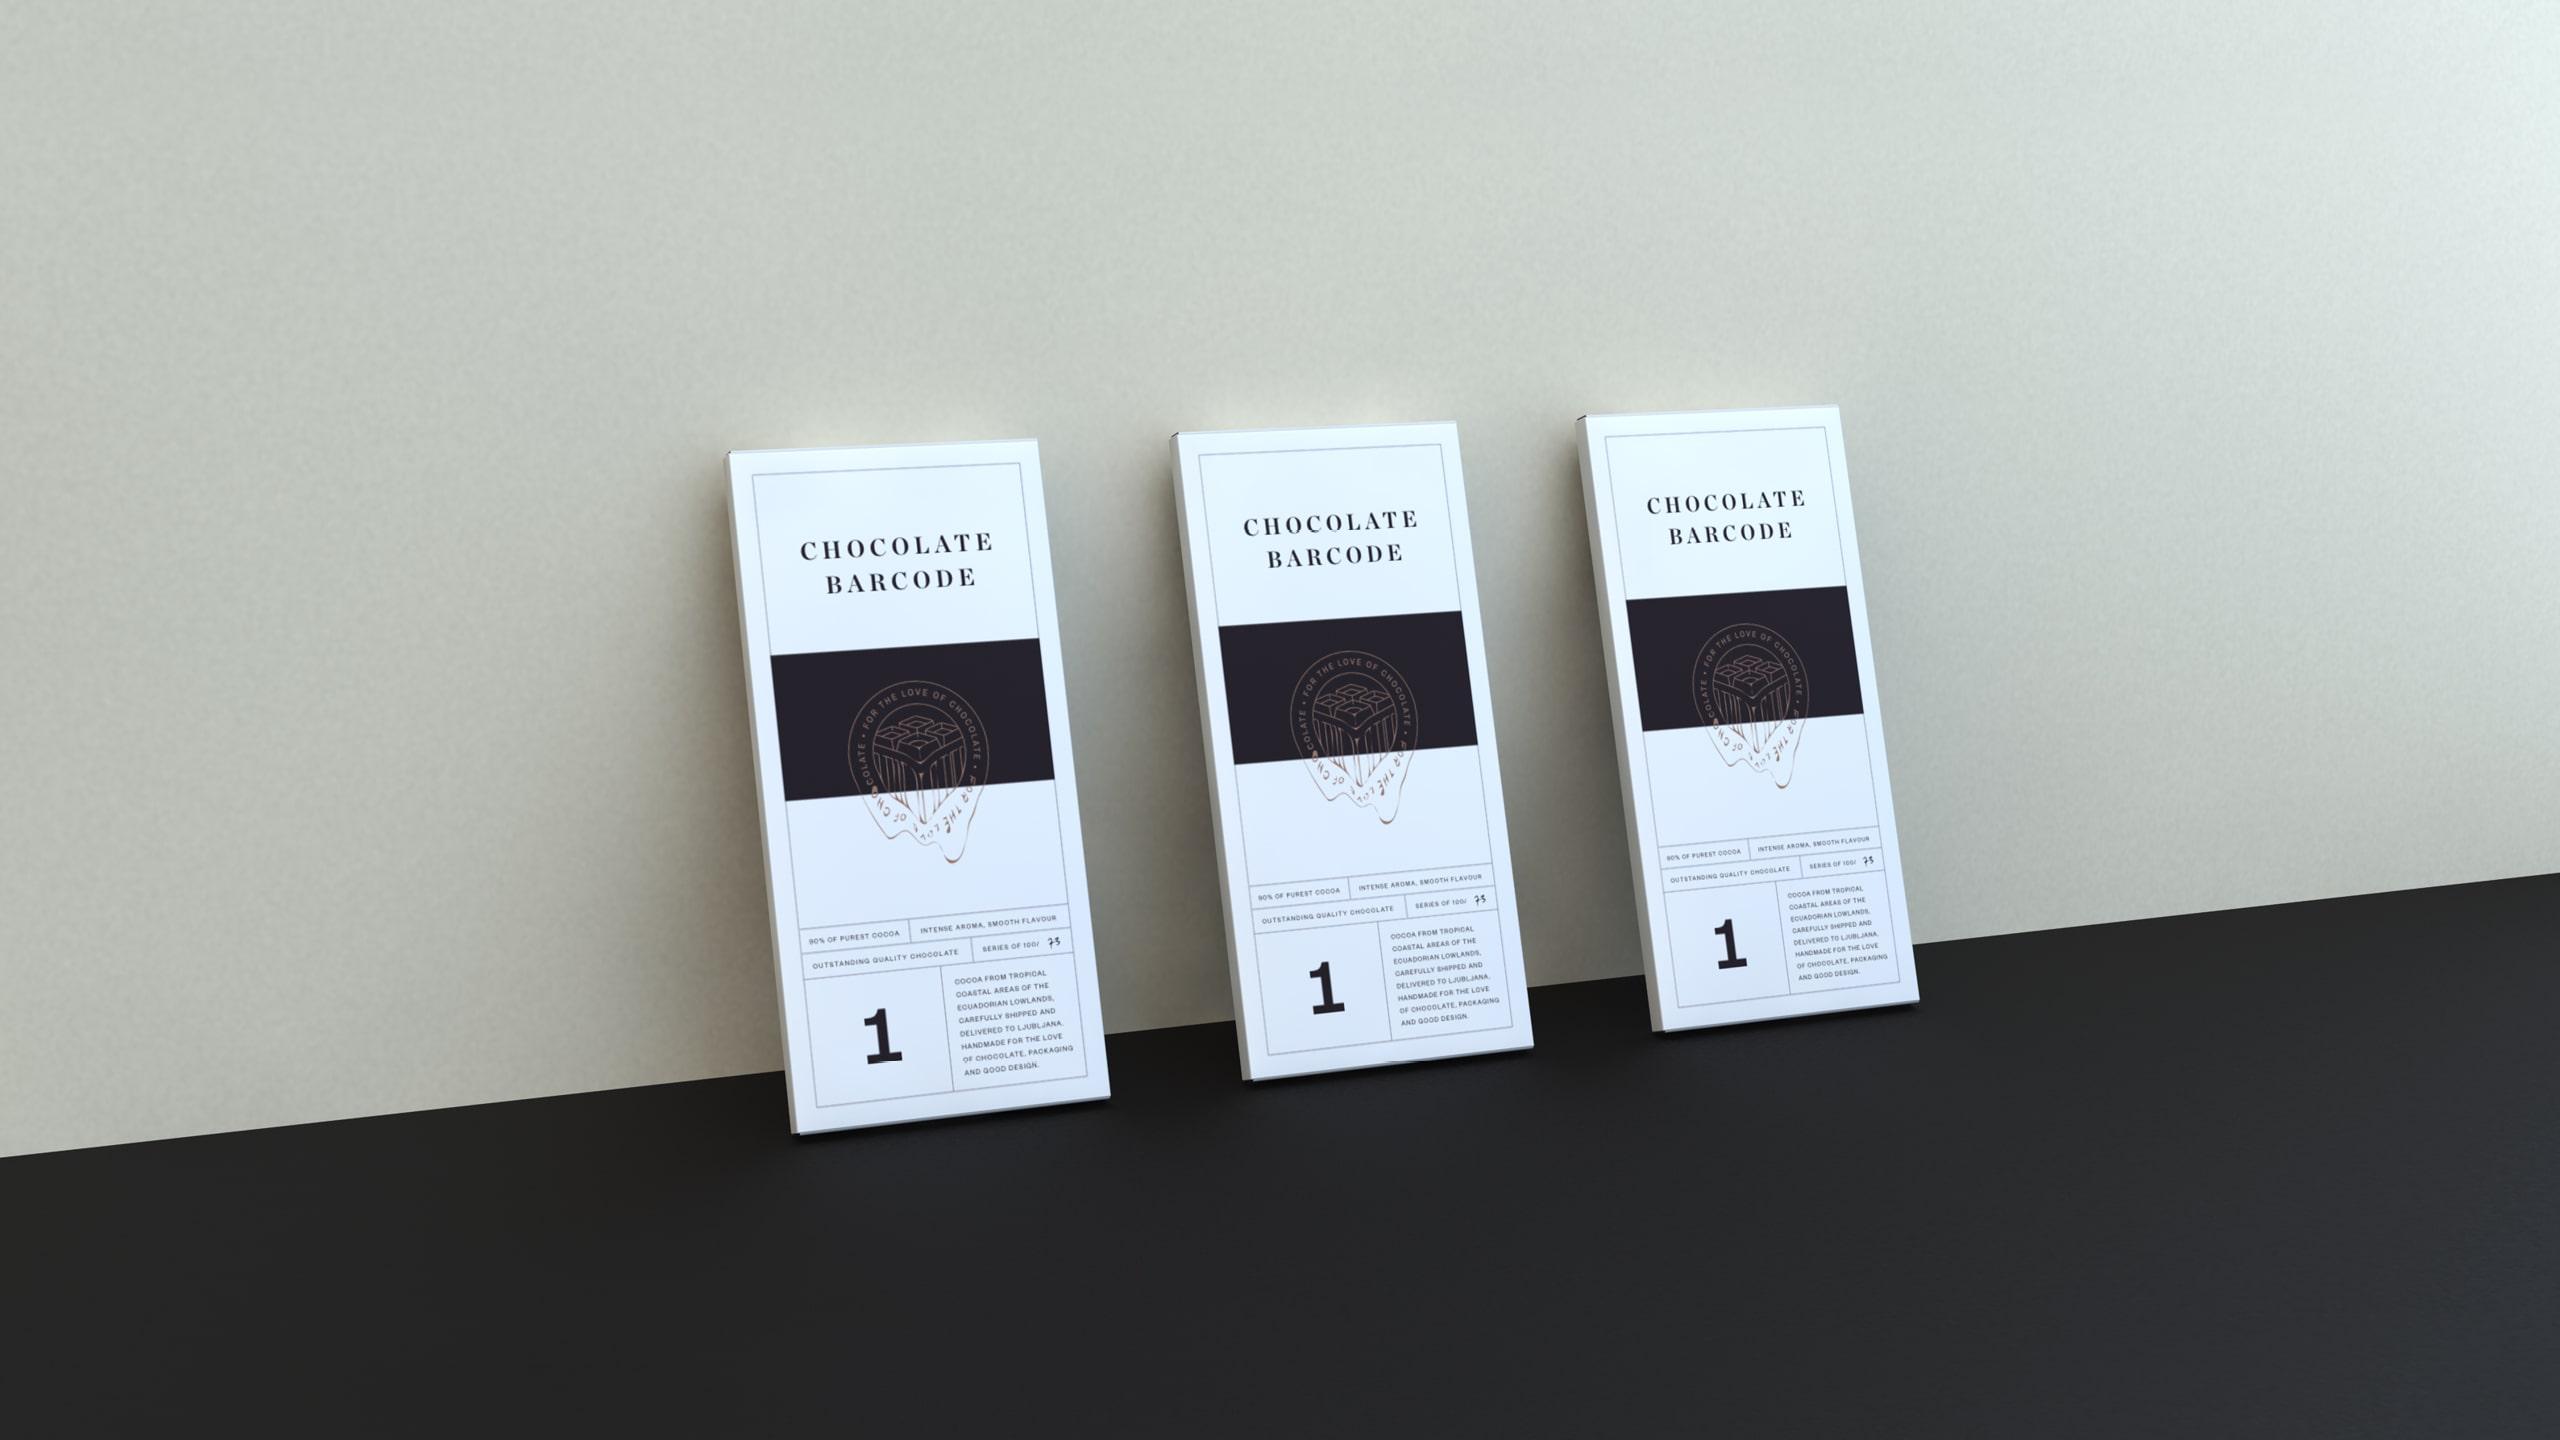 mantik-digital-branding-development-agency-chocolate-packaging-webdesign-design-9-min